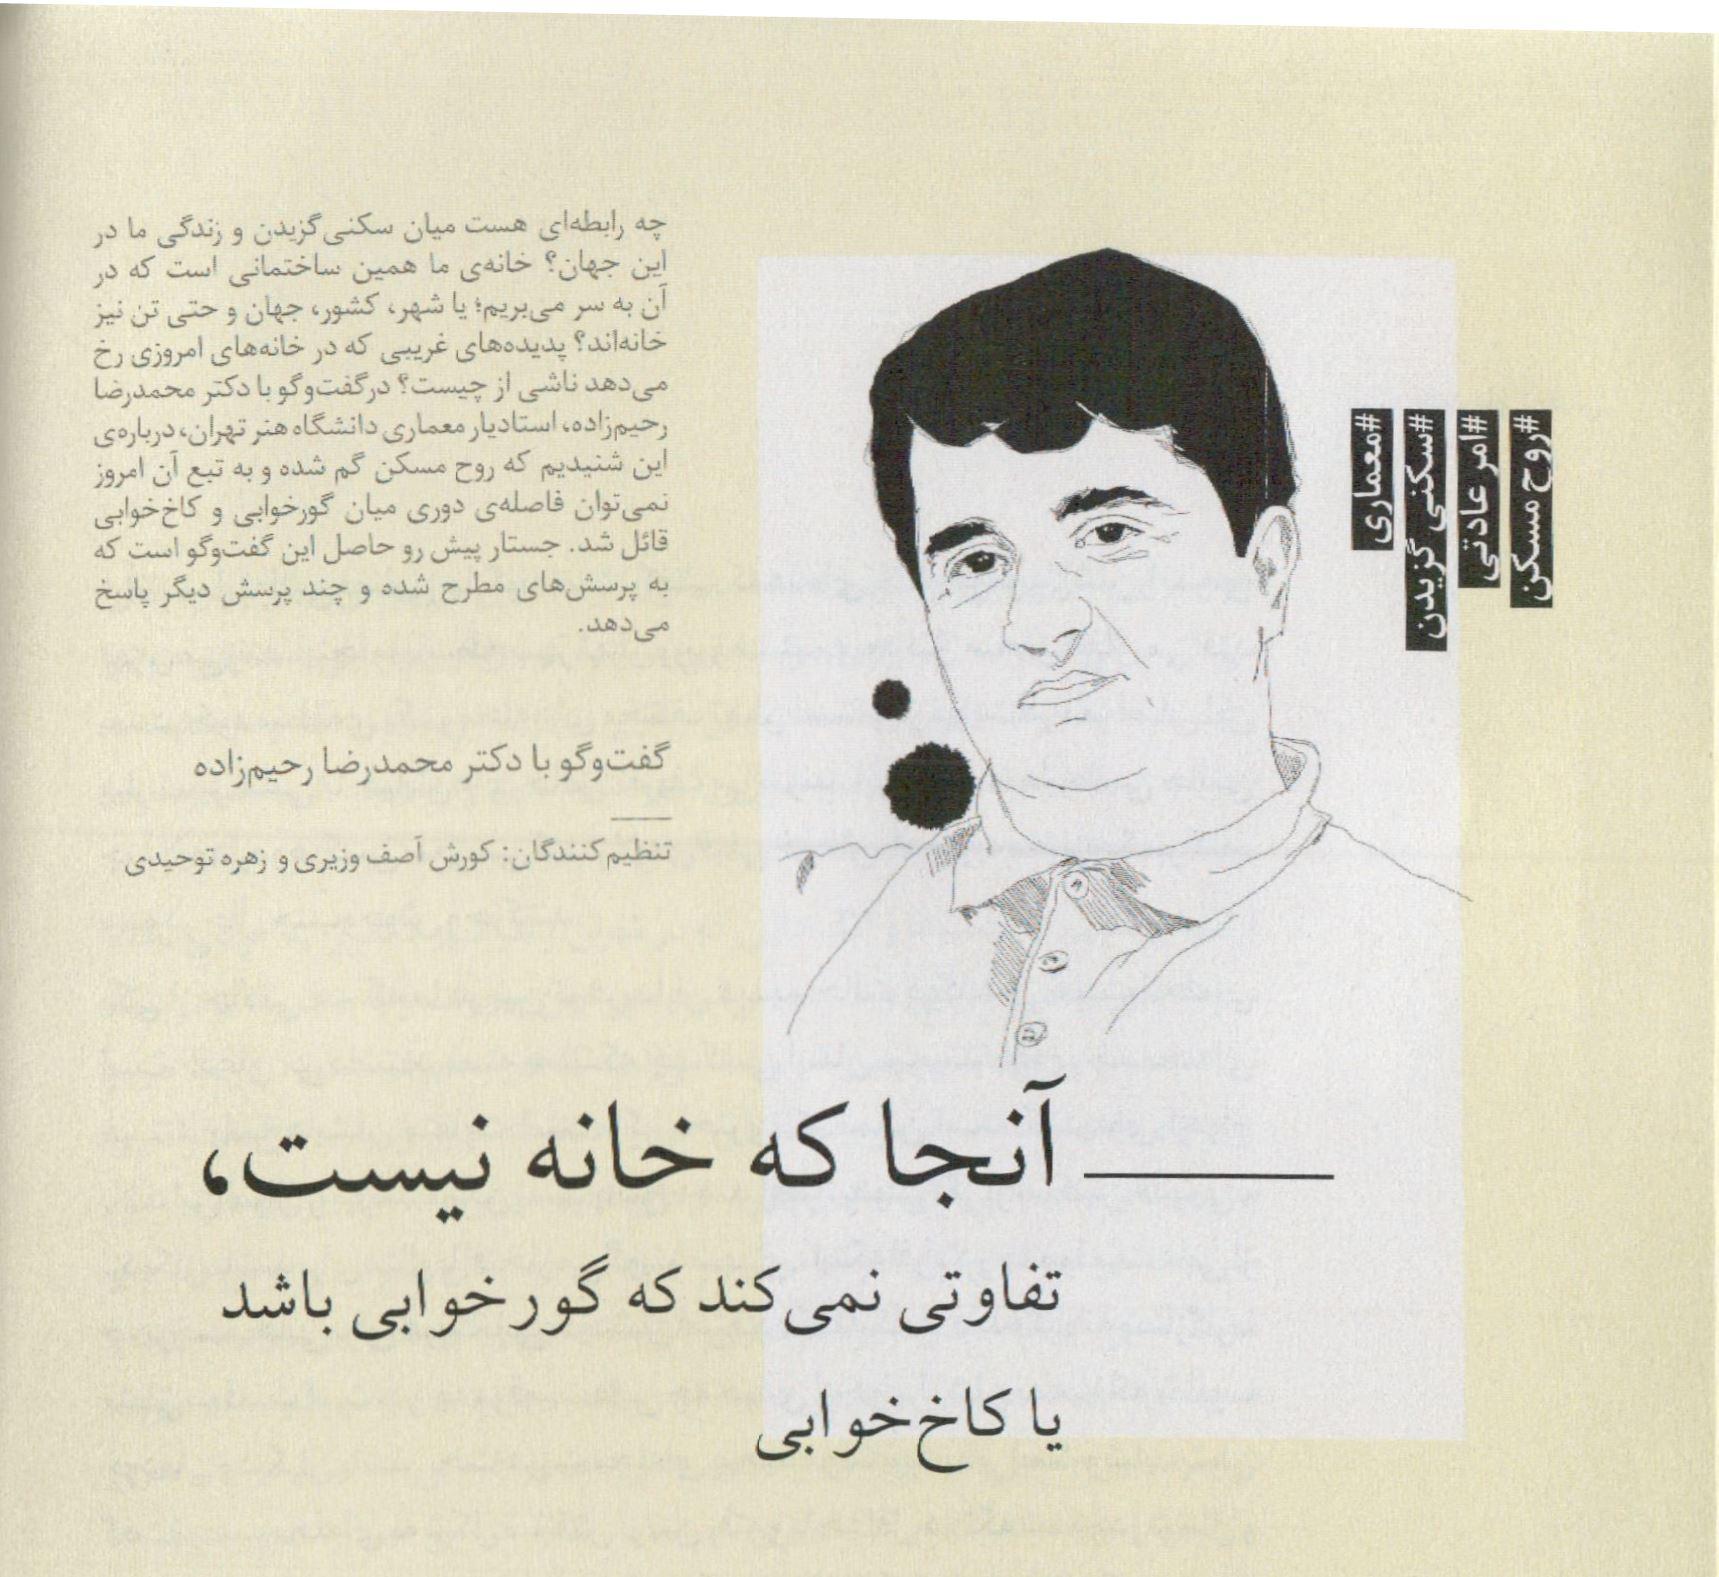 IMG_0748 علی جاودانی انتقاد از خود (1/5): نگاهی به اشکالات پیش روی متفکران انتقادی حوزۀ معماری در ایران IMG 0748